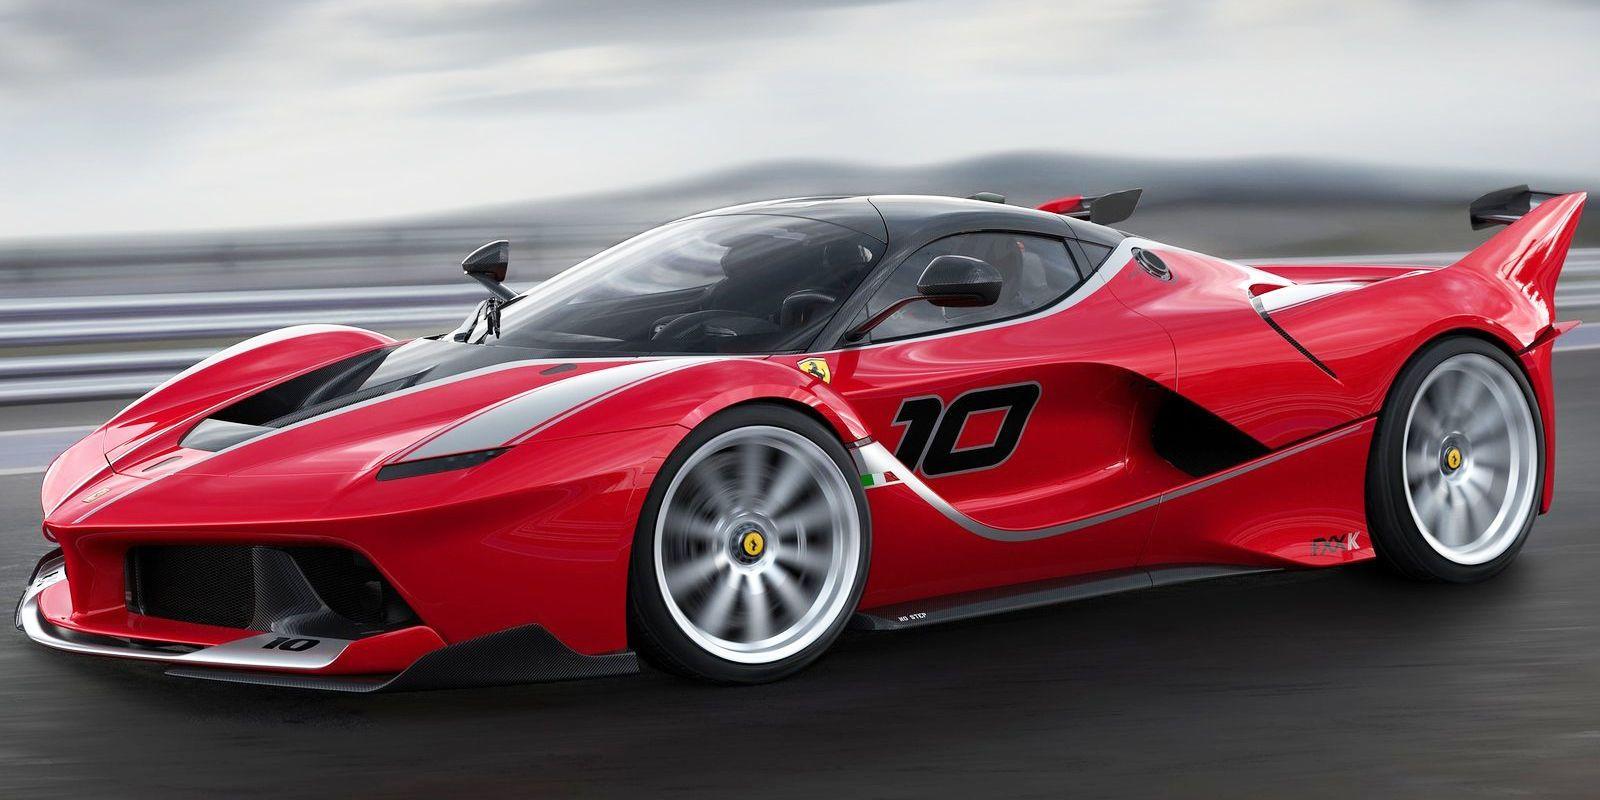 Ferrari Won't Set a Nurburgring Lap Time With the FXX K, Stop Asking